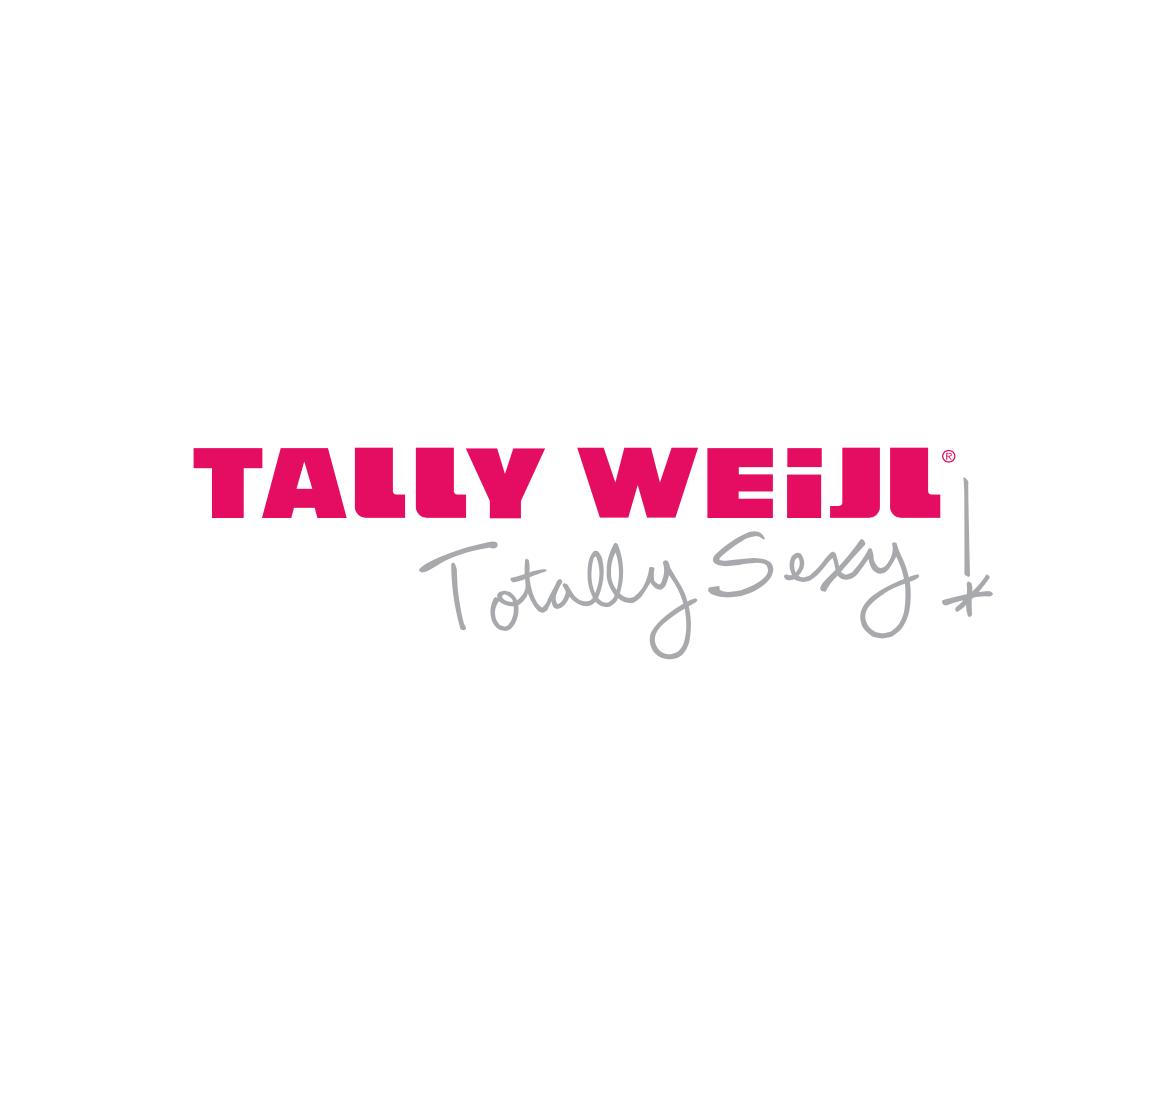 Tallyweil.png